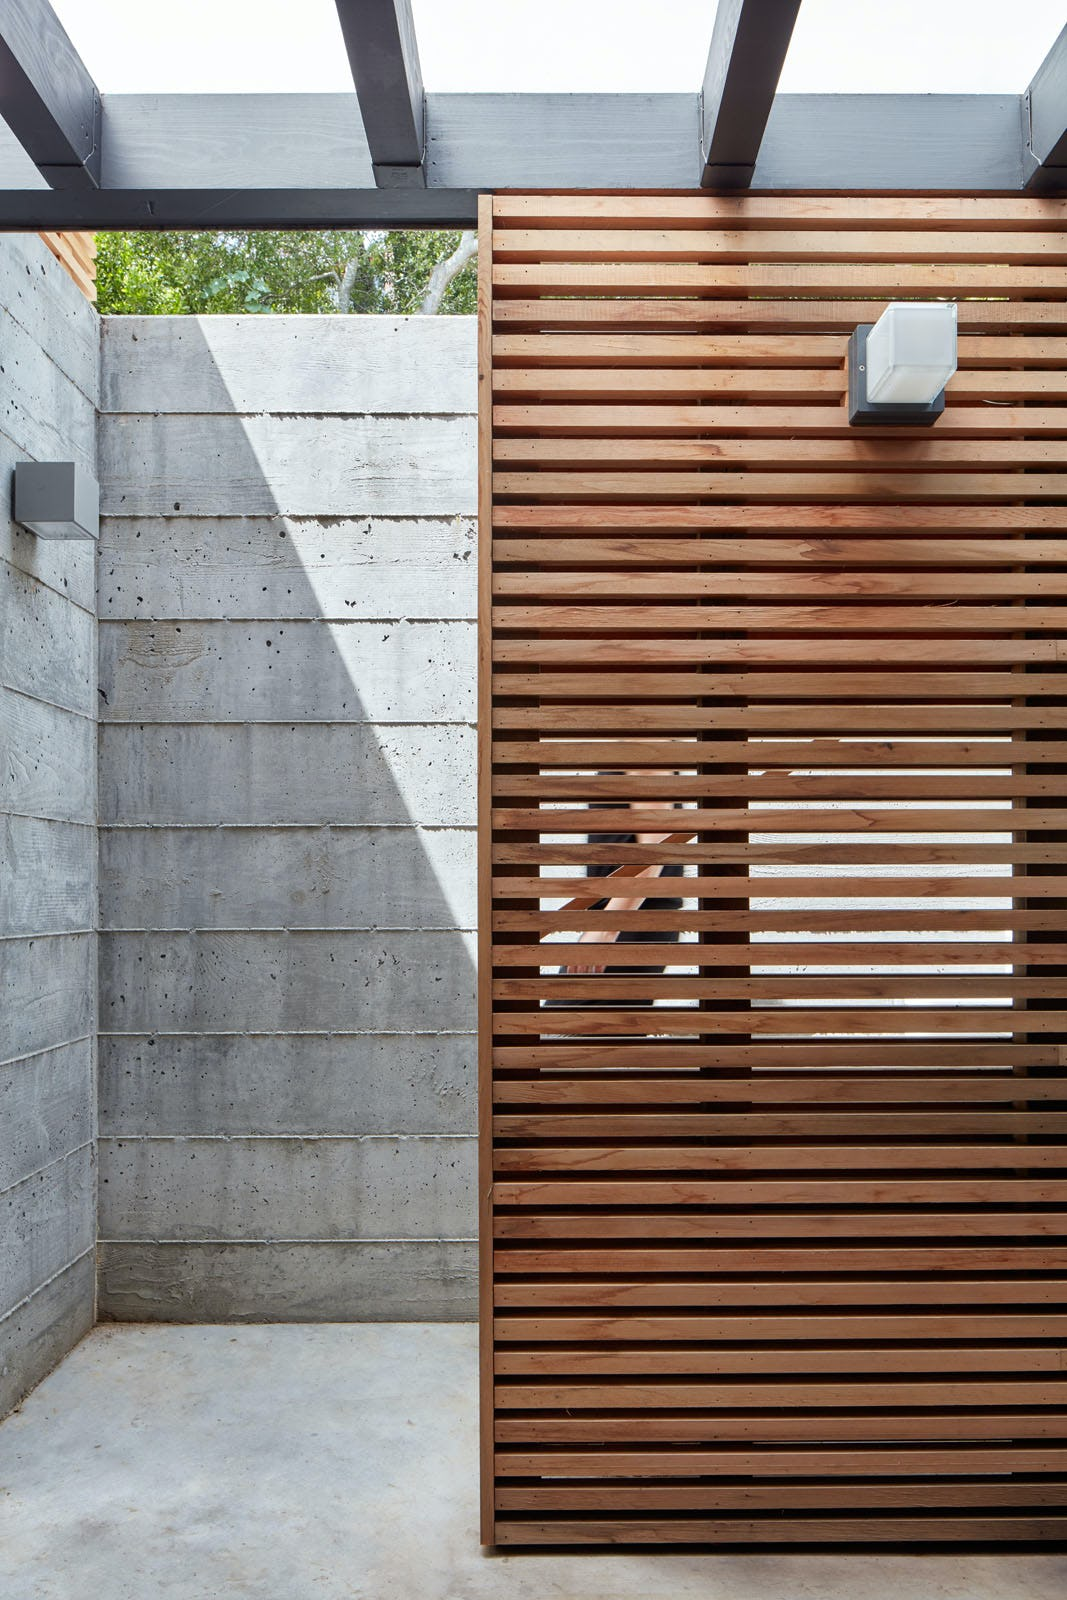 Builtform construction 441tamresidence detail patio modern wood smaller